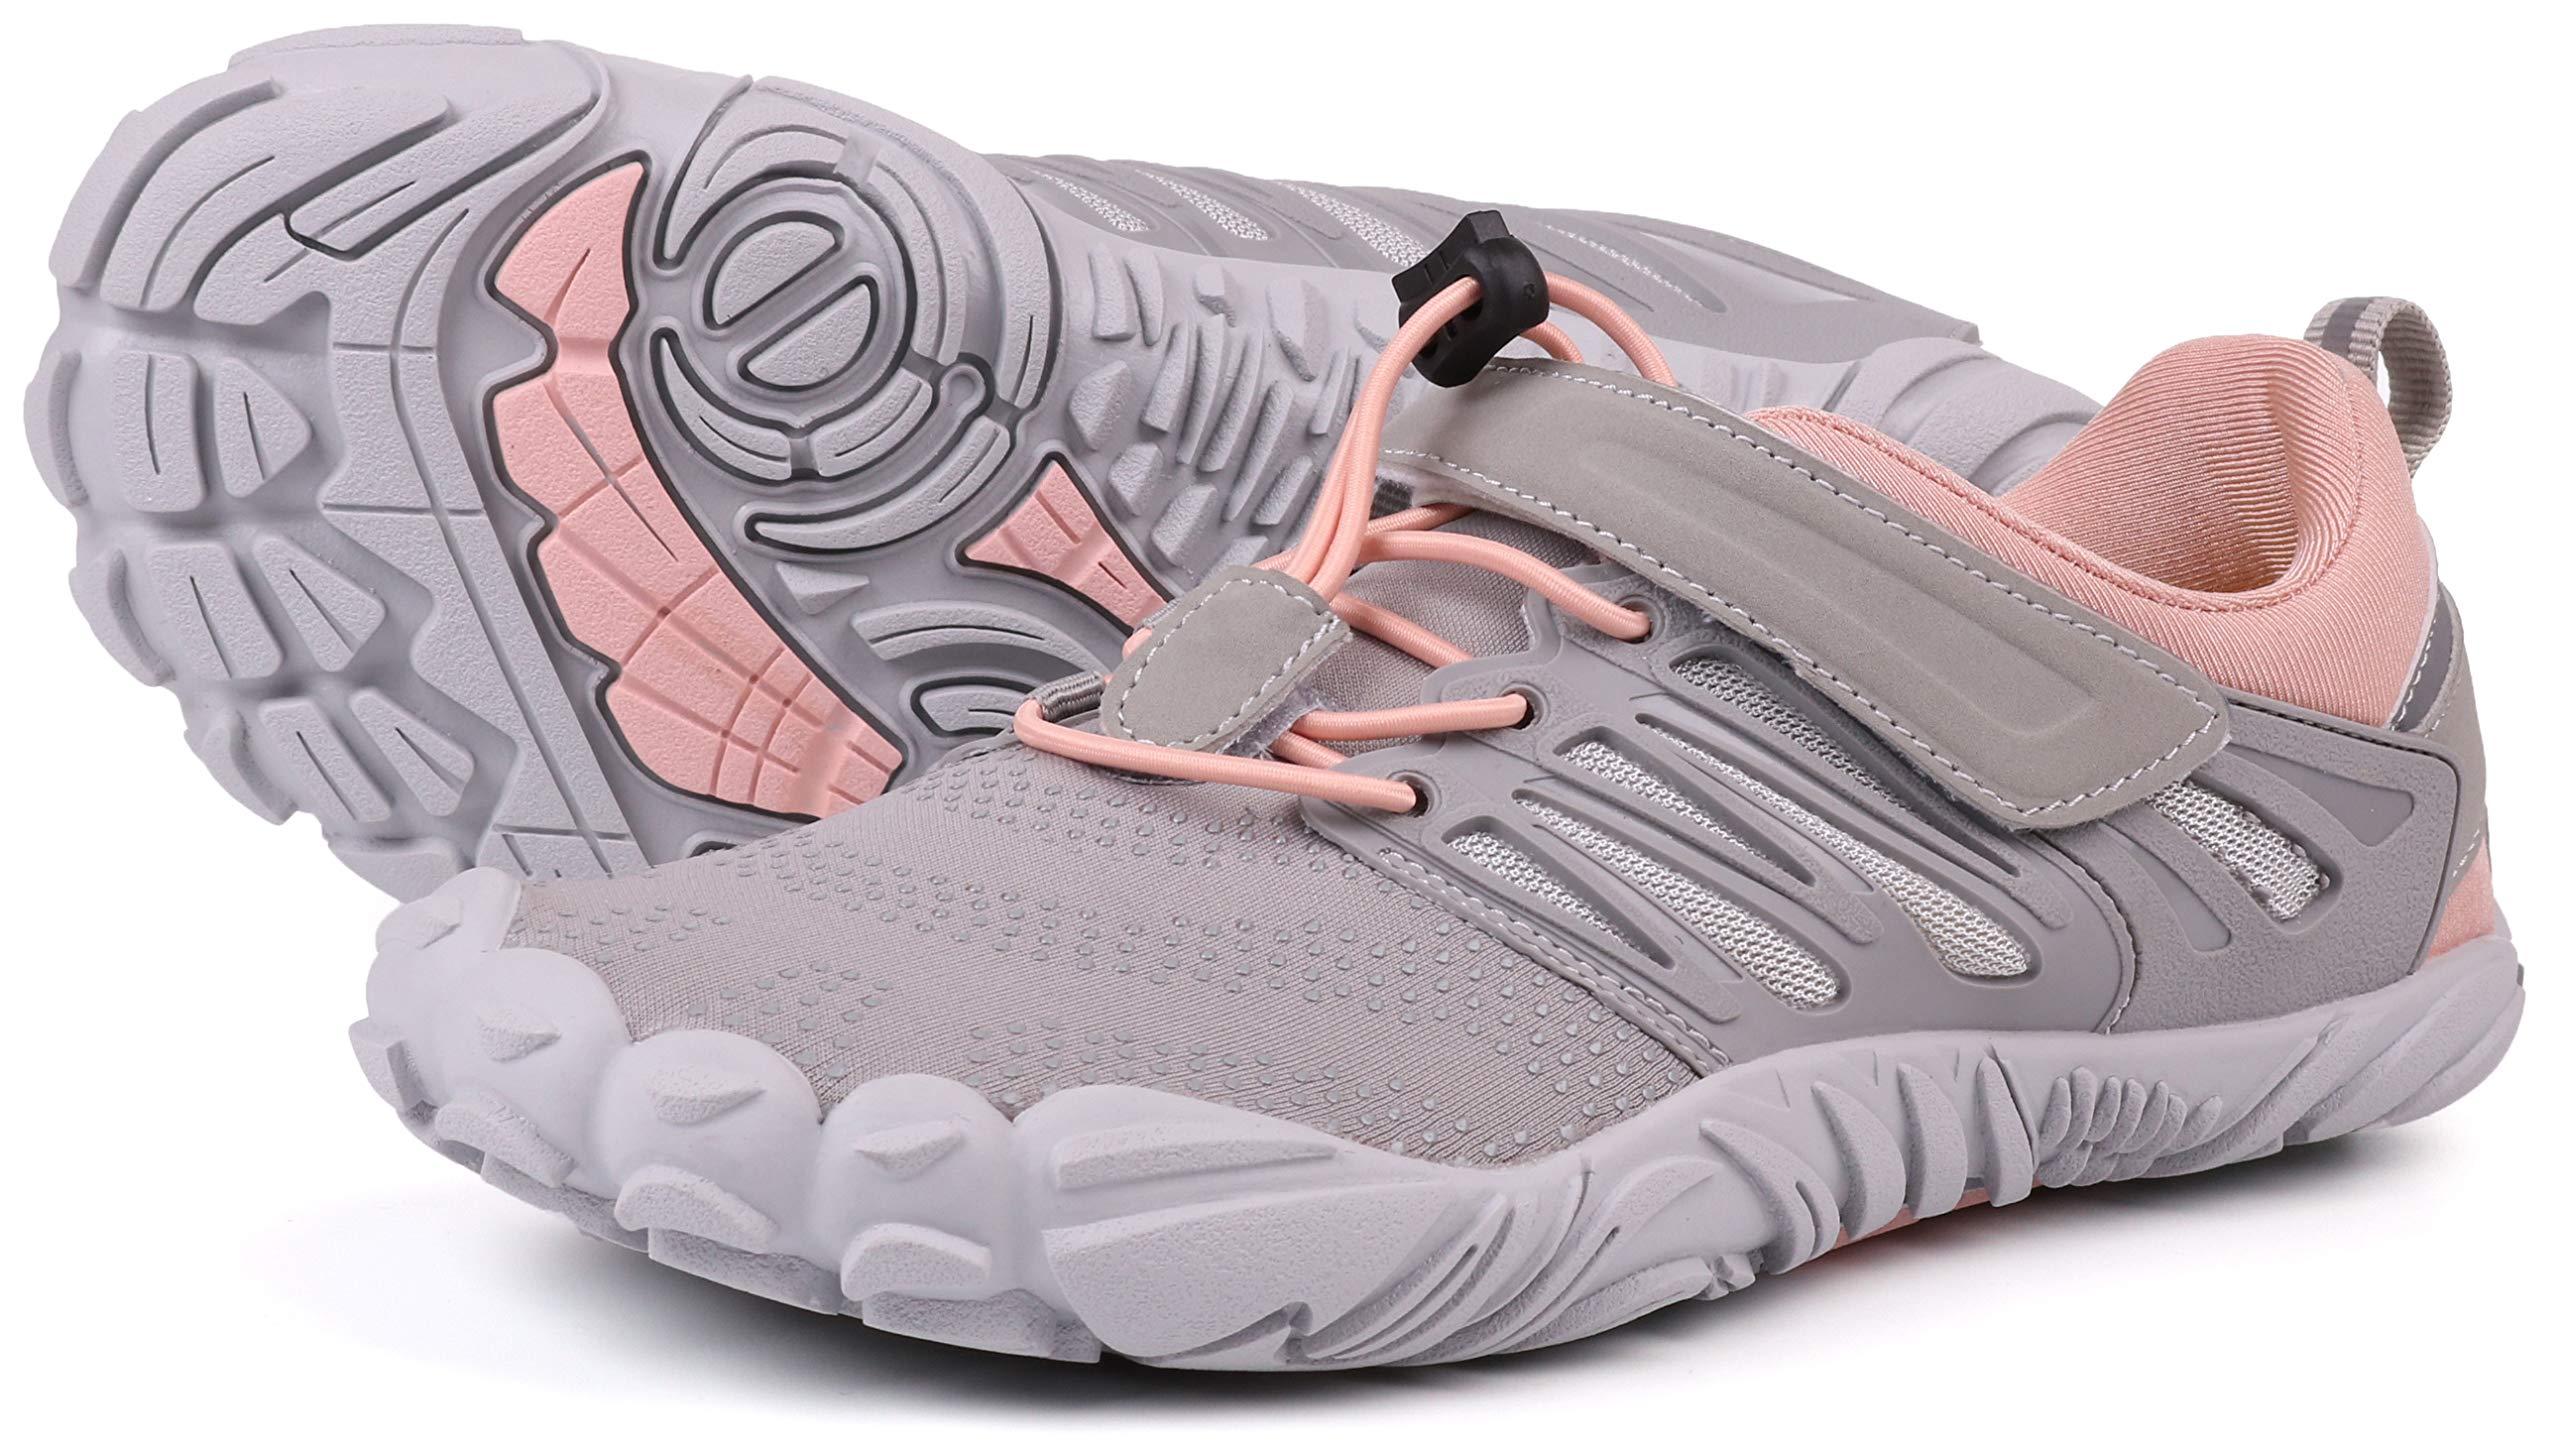 JOOMRA Women's Trail Running Shoes Grey Walking Camping Trekking Toes Five Fingers Ladies Hiking Glove Workout Sneaker Barefoot Walking Footwear Size 7